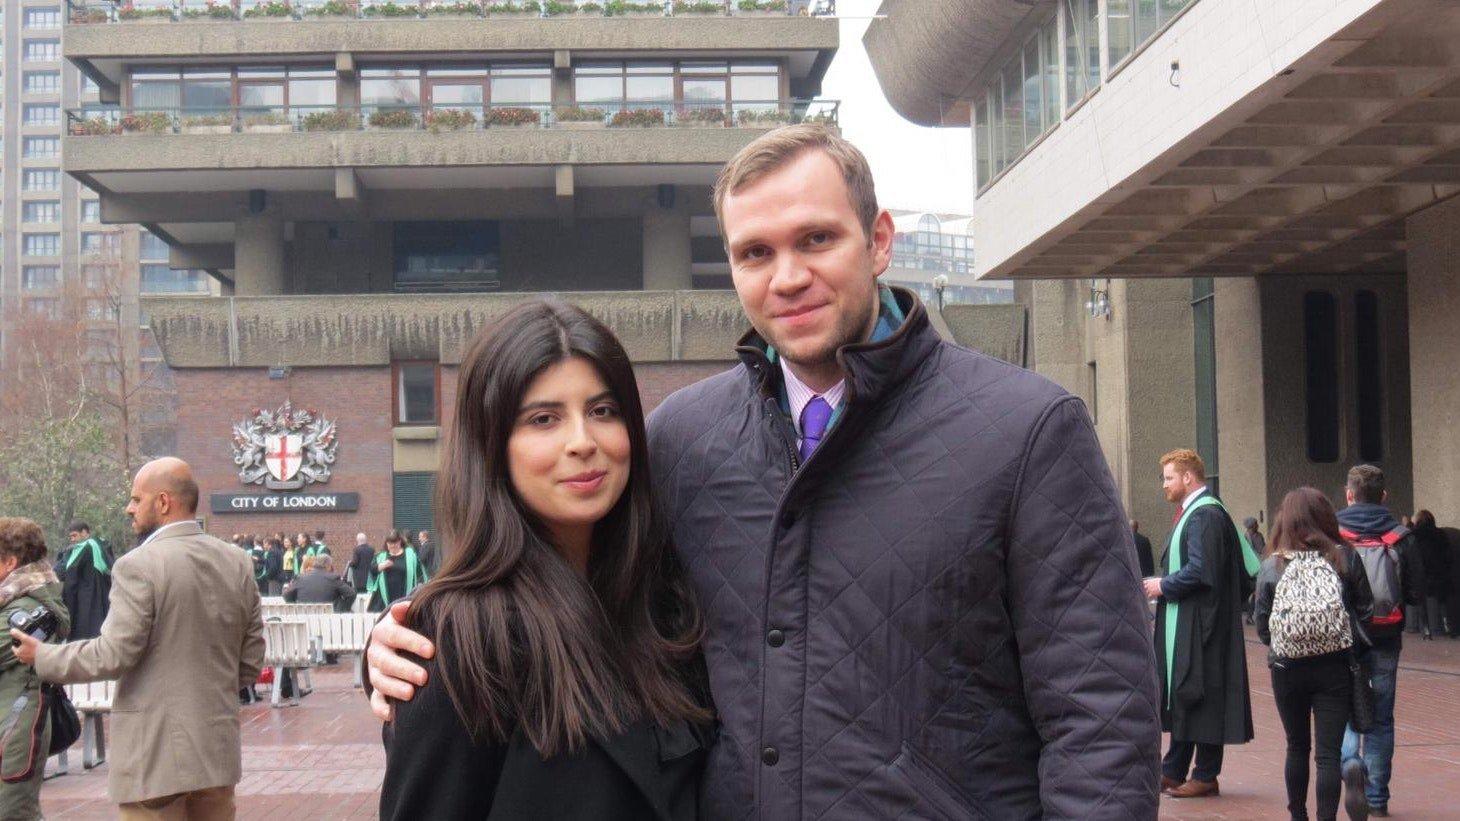 Wife of United Kingdom man jailed in UAE blames London